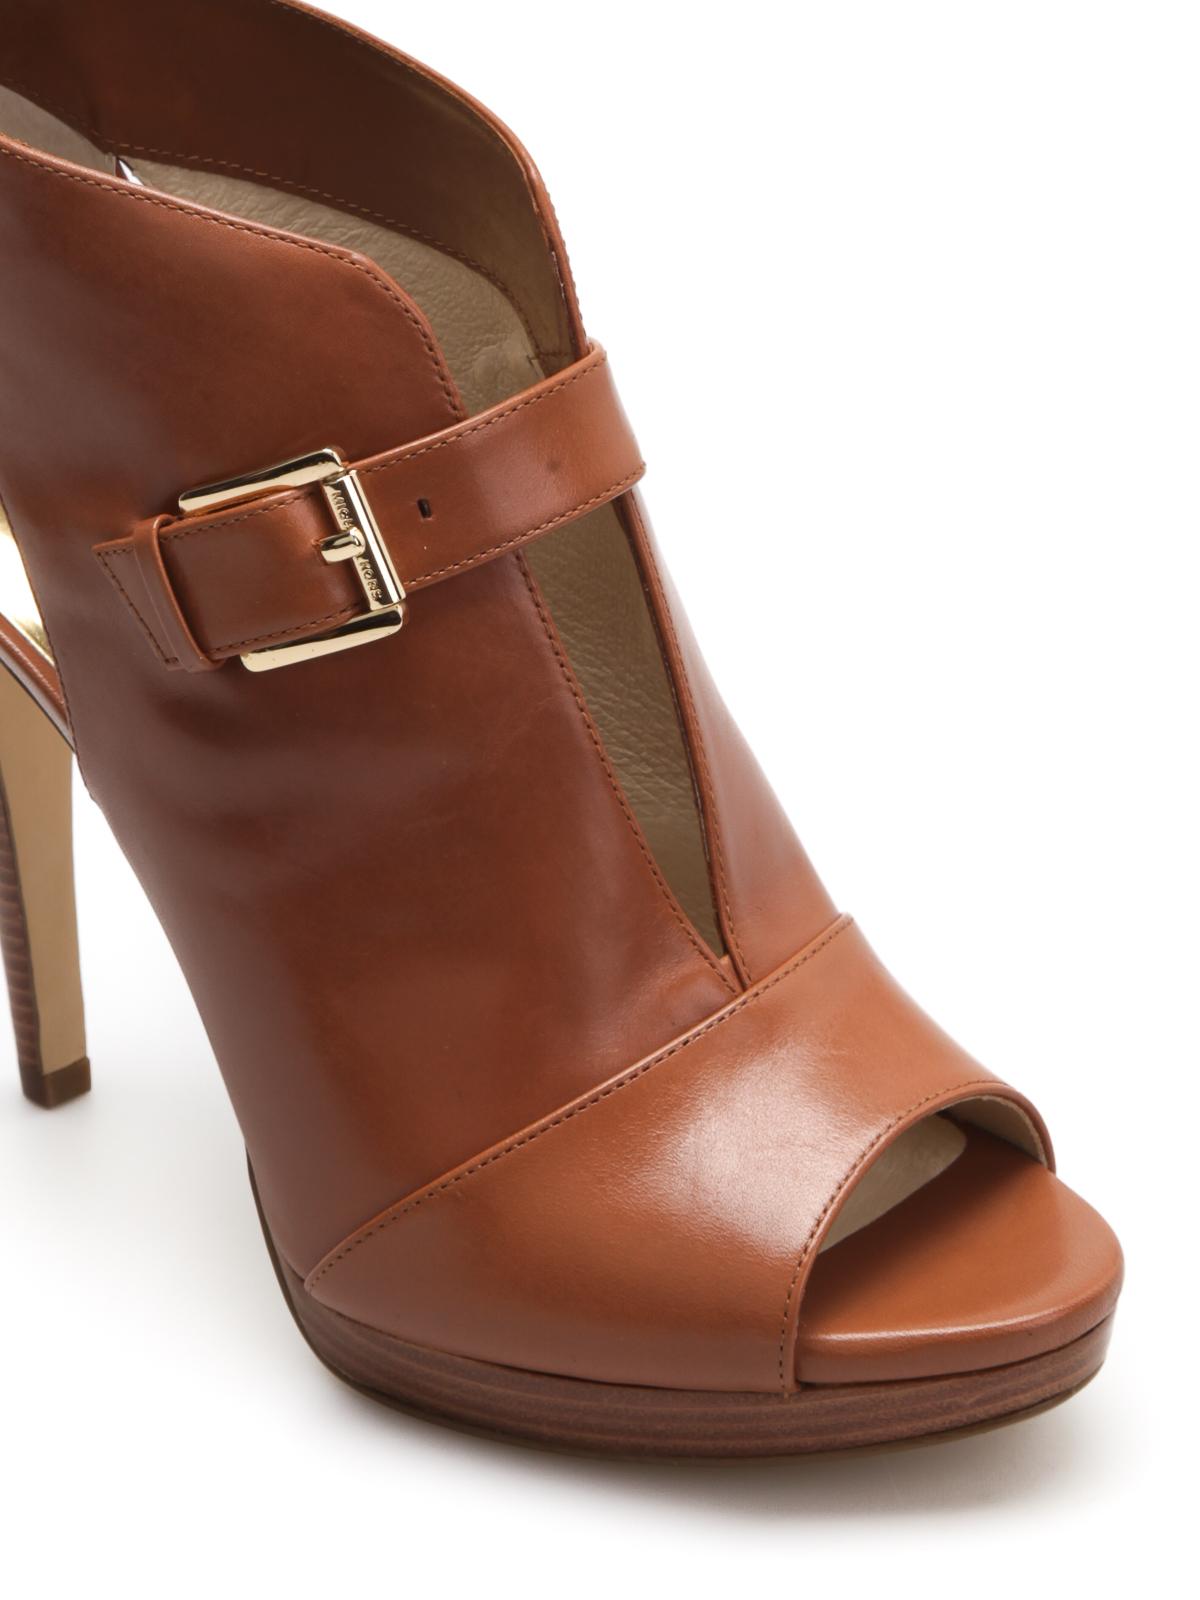 Michael Kors - Isabella leather pump